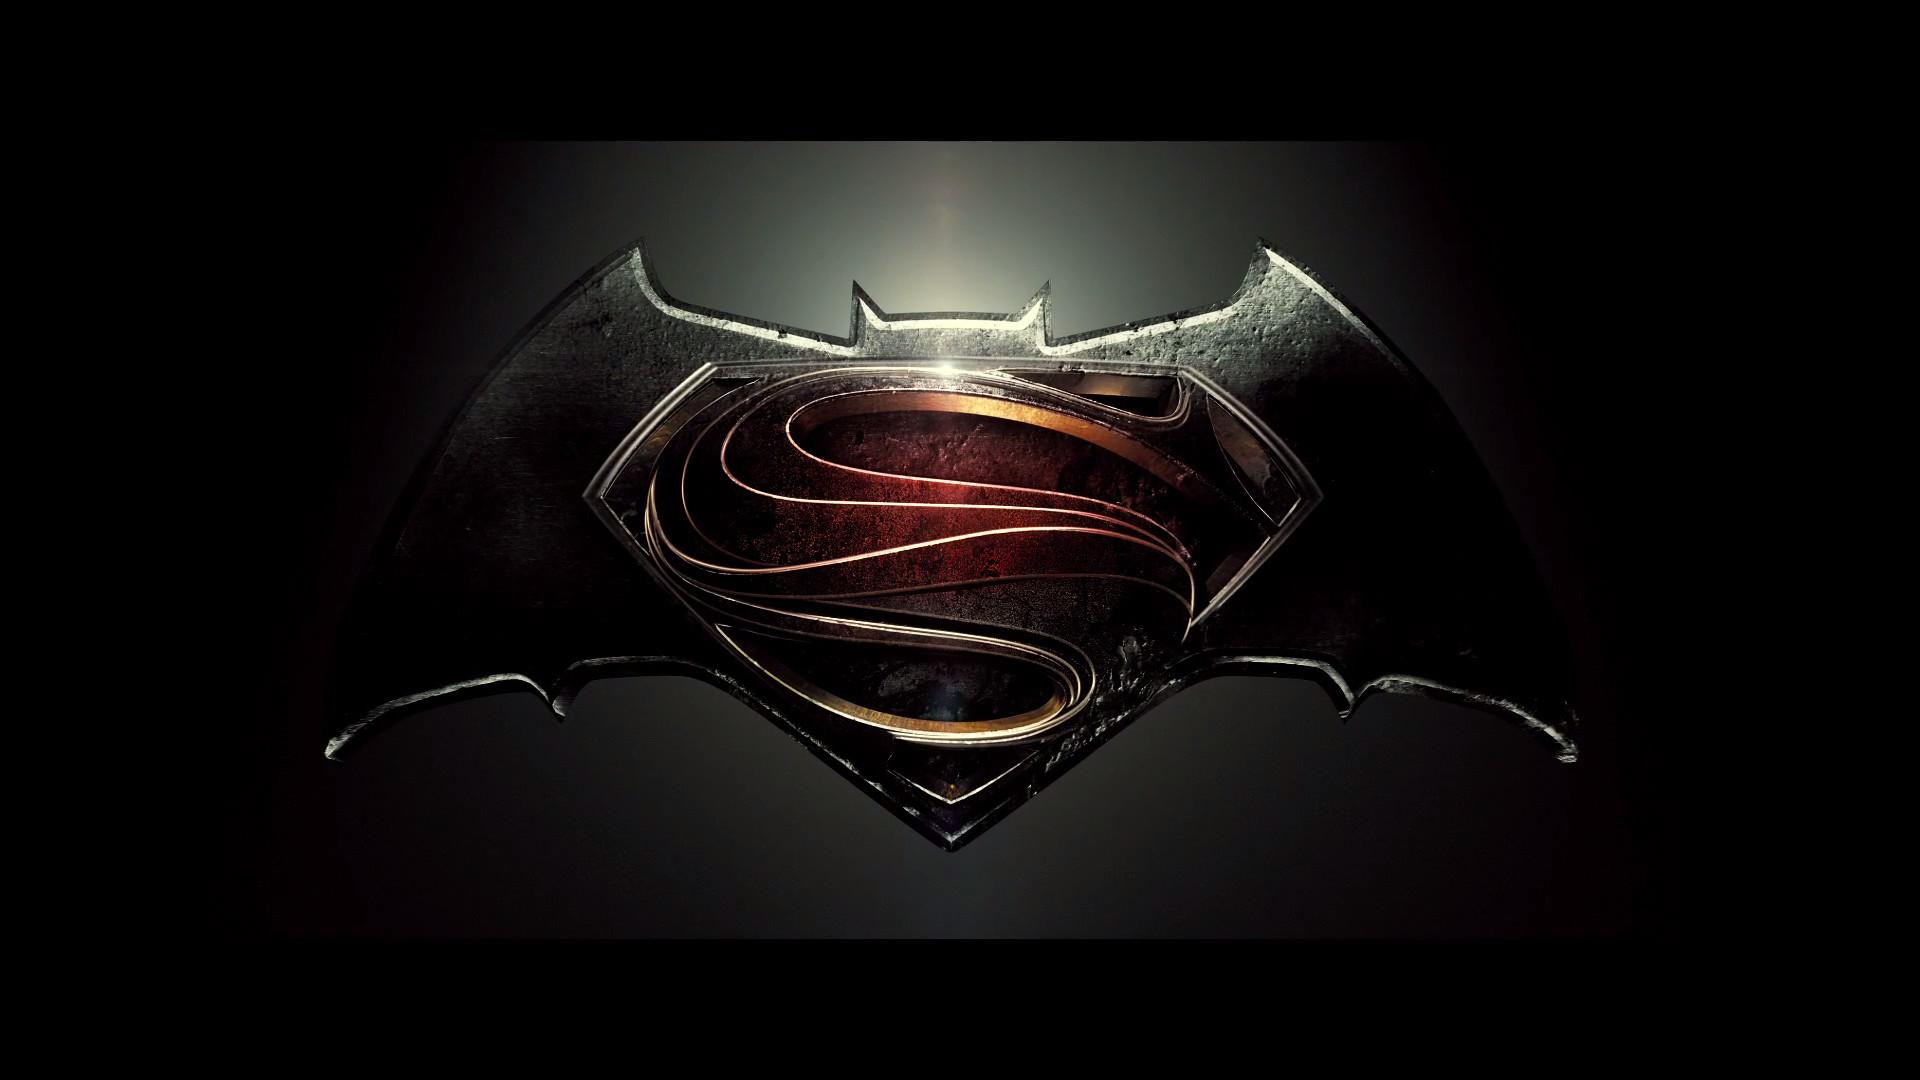 Related Wallpaper for University of Washington Background. Batman vs  Superman